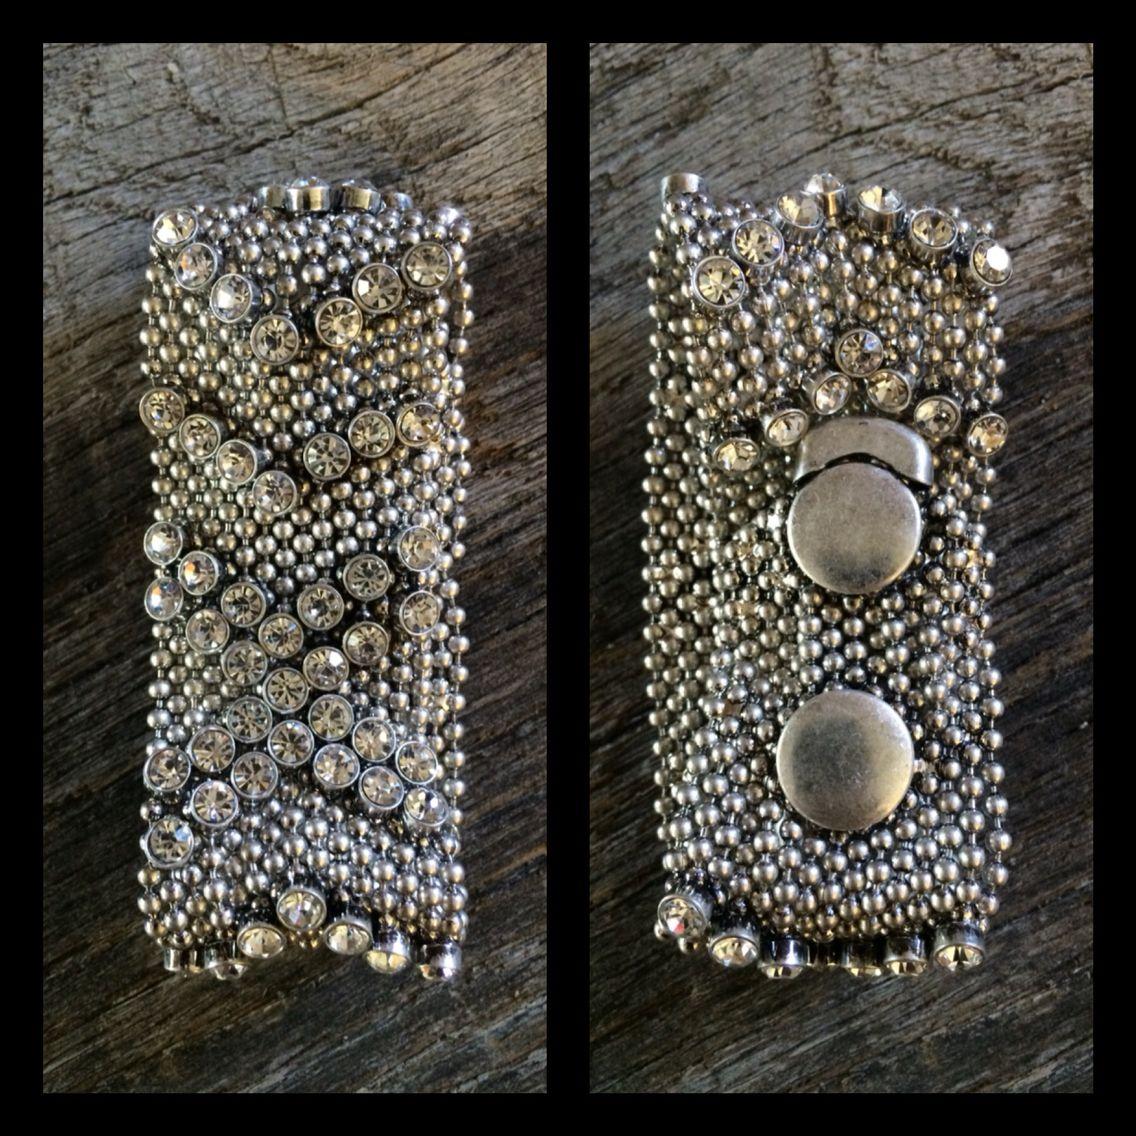 Premier designs jewelry 2015 - New Premier Designs Make A Scene Bracelet